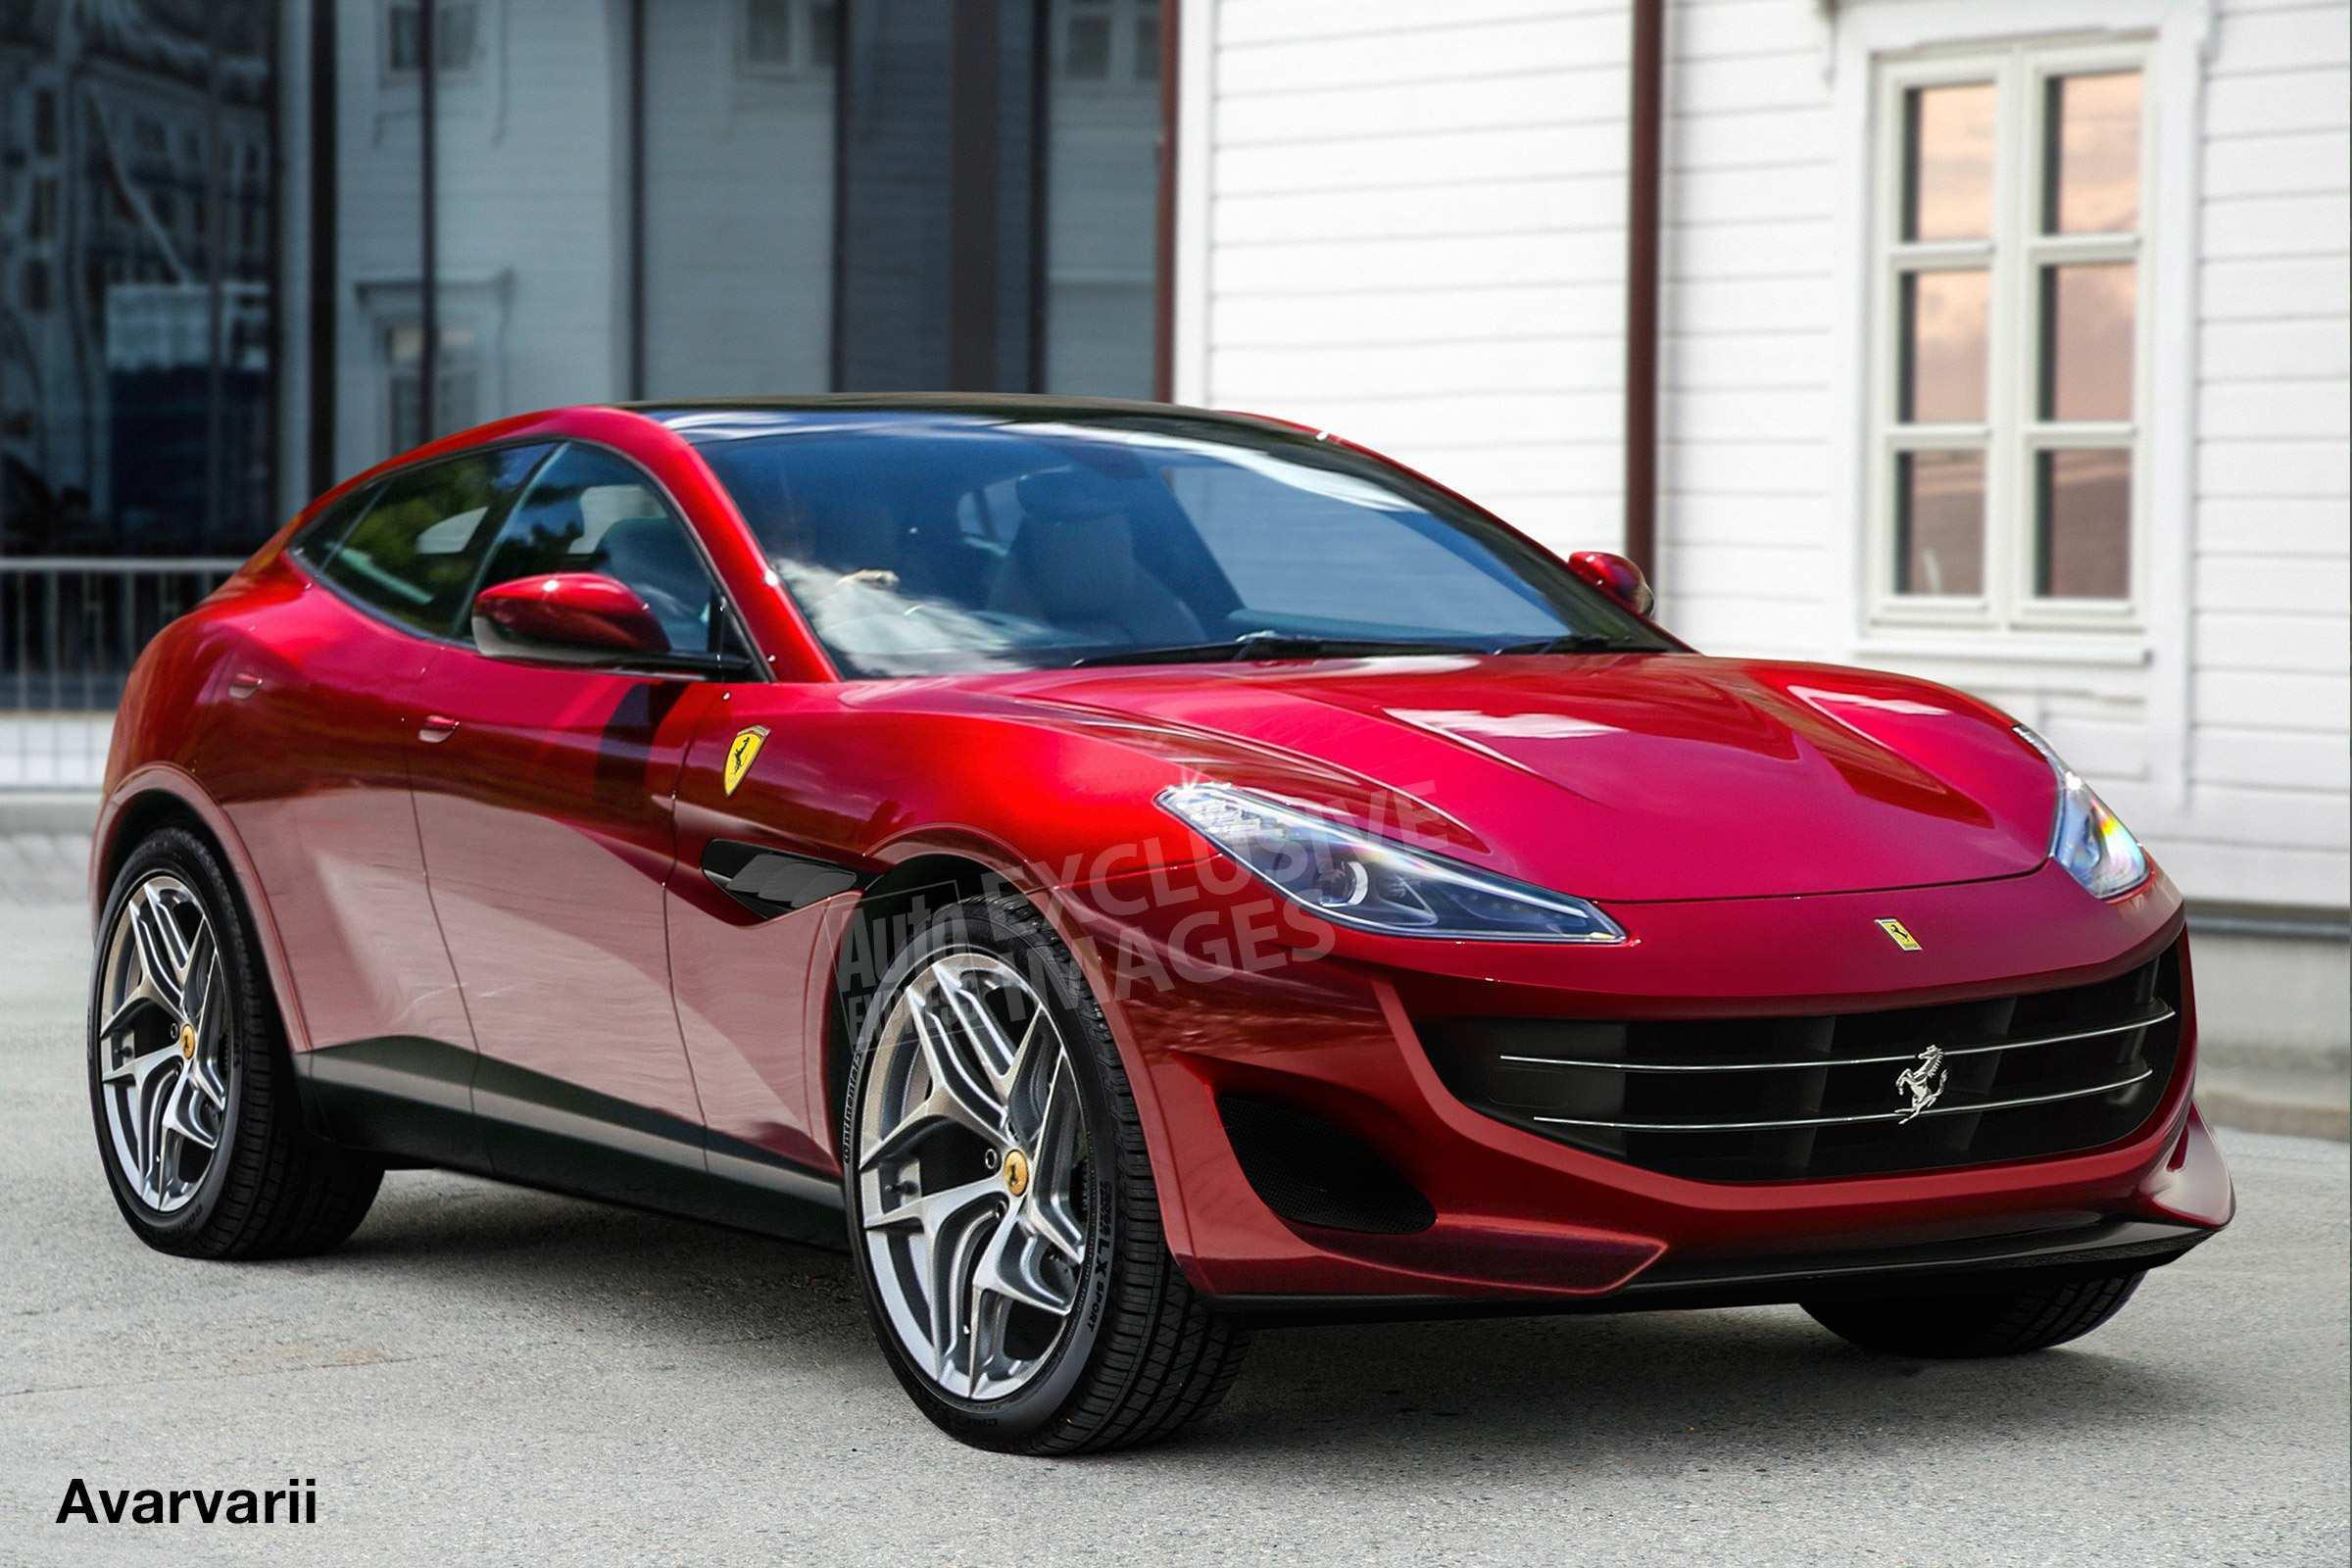 58 Best Review 2020 Ferrari Cars Interior by 2020 Ferrari Cars